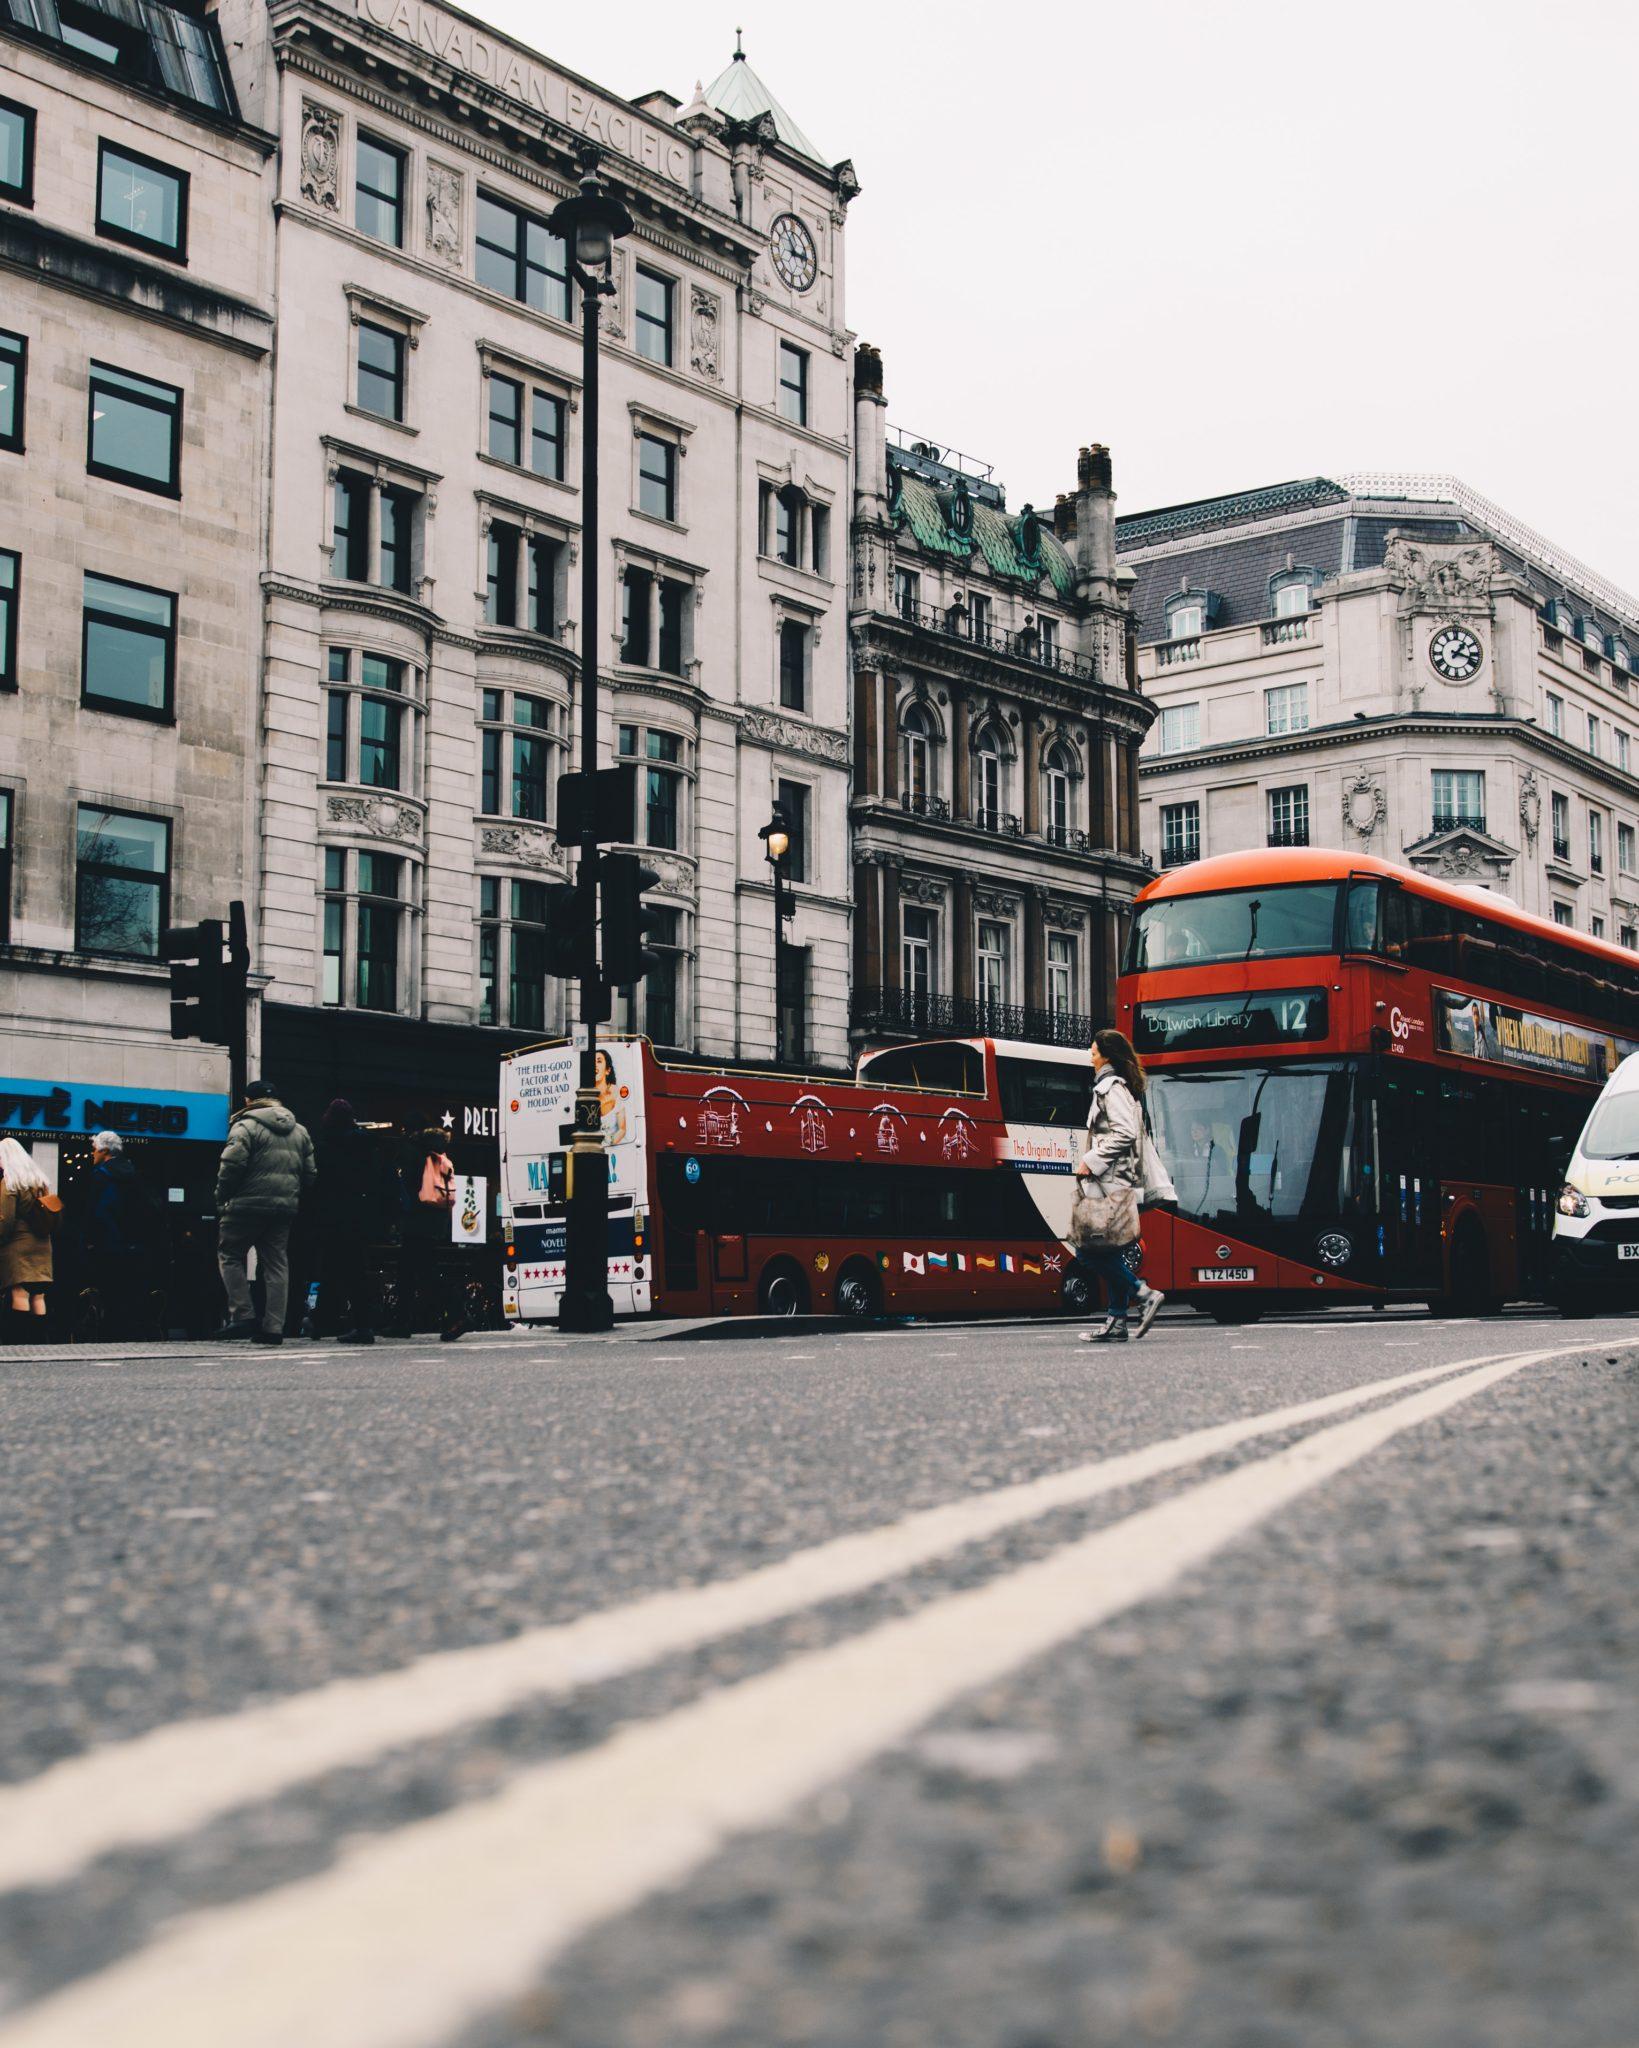 Trafalgar square London | WORLD OF WANDERLUST